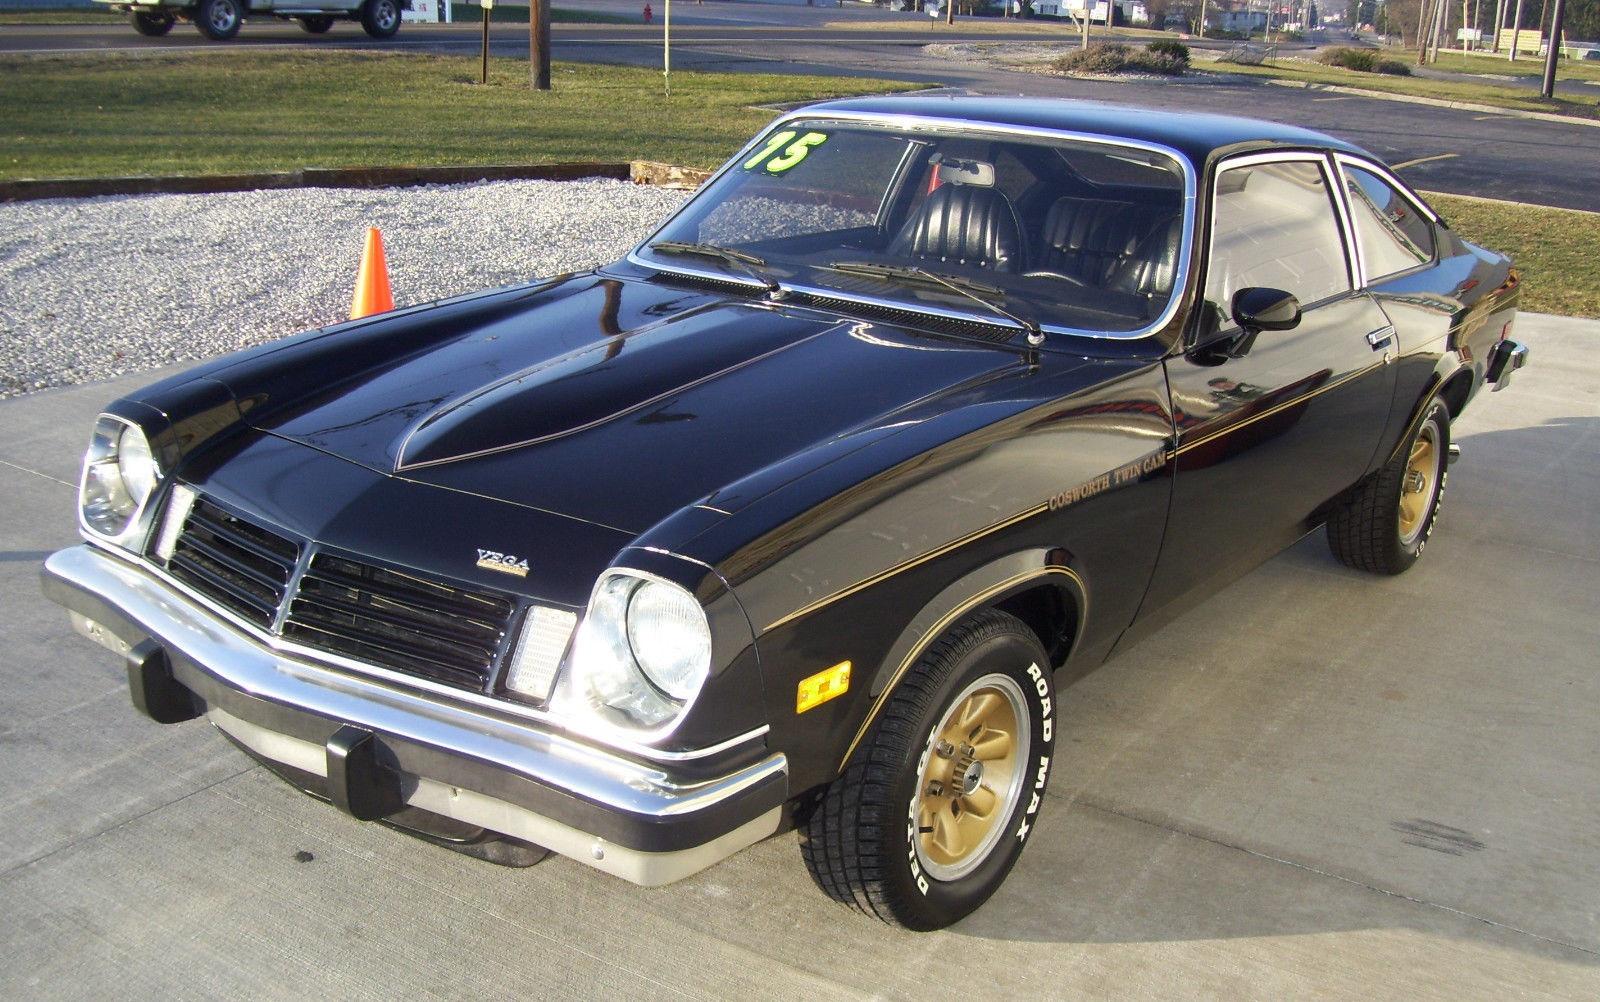 American Sports Sedan: 1975 Cosworth Vega